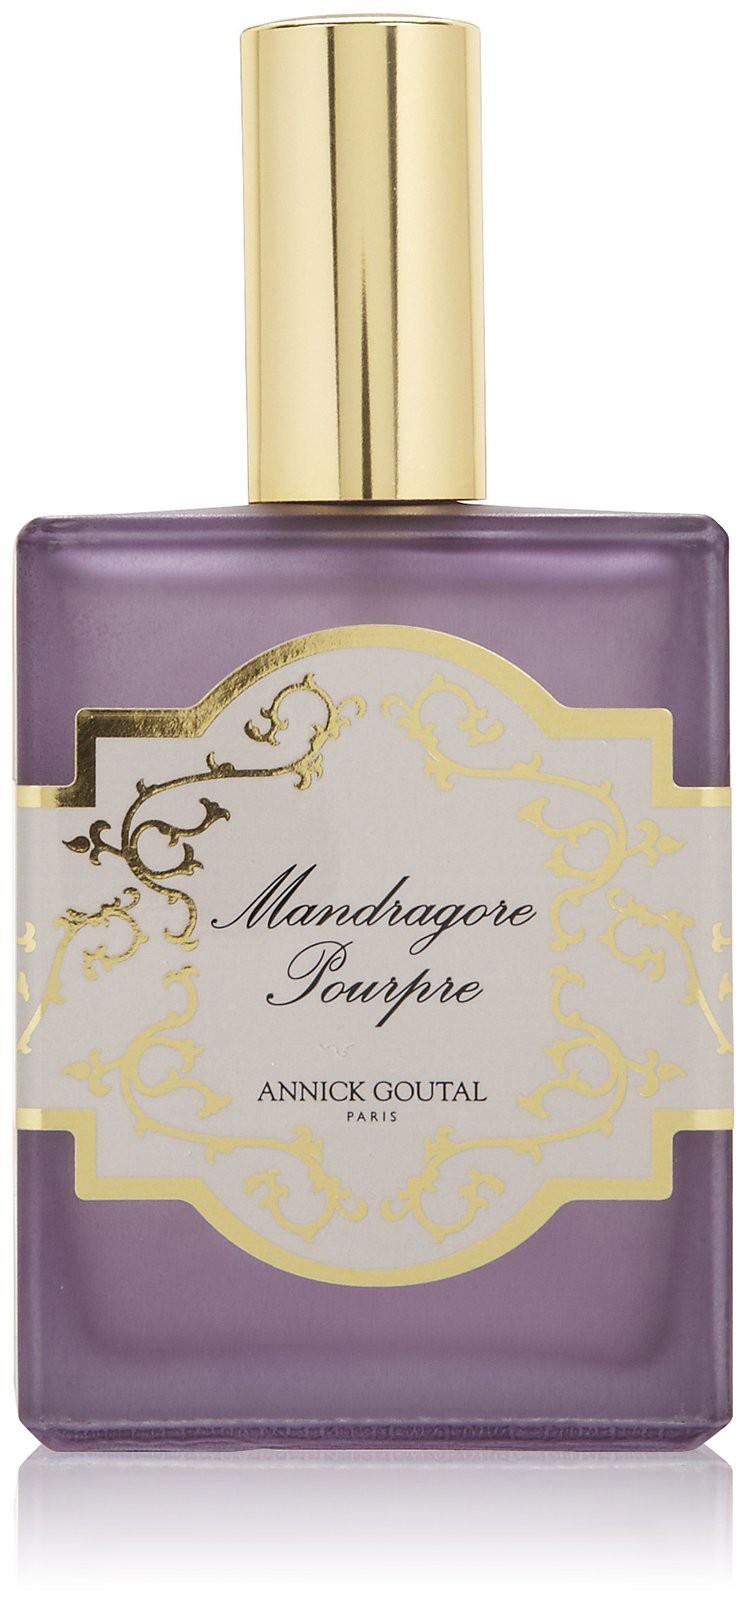 Goutal Mandragore Pourpre аромат для мужчин и женщин